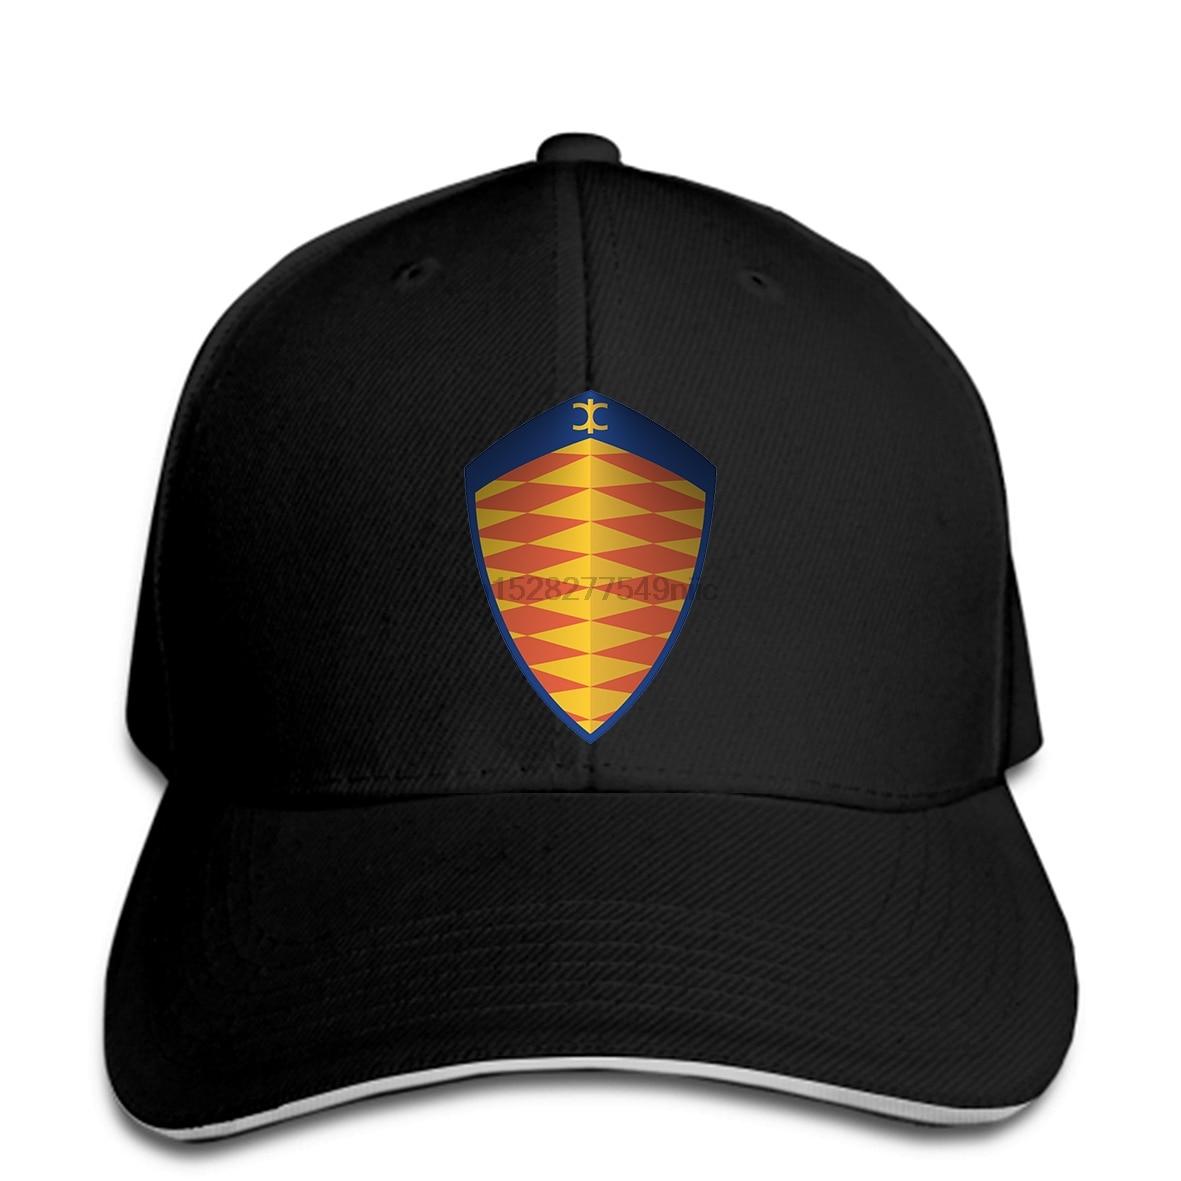 Boné de beisebol masculino koenigsegg logotipo ícone koenigsegg logotipo do carro download do logotipo snapback chapéu feminino pico